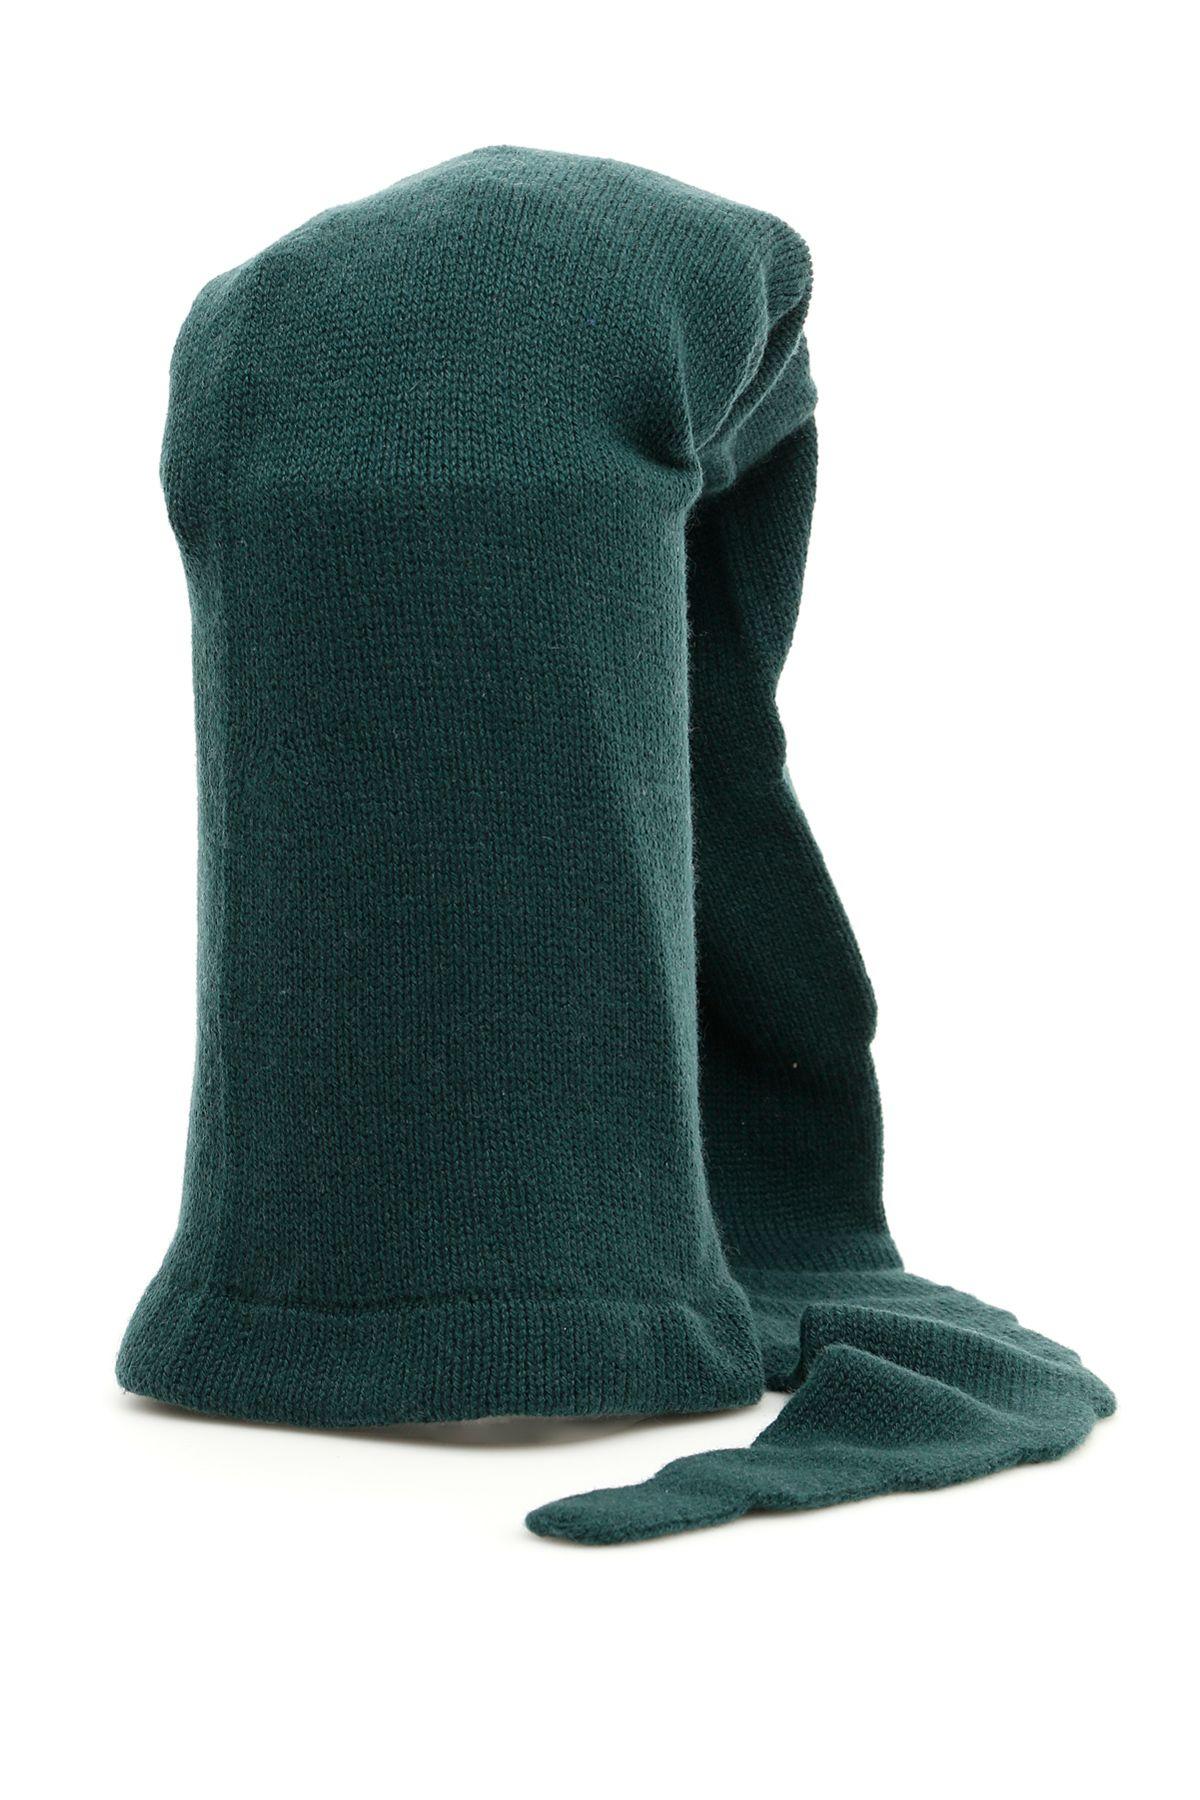 FLAPPER Extra Long Atena Hat in Basalt